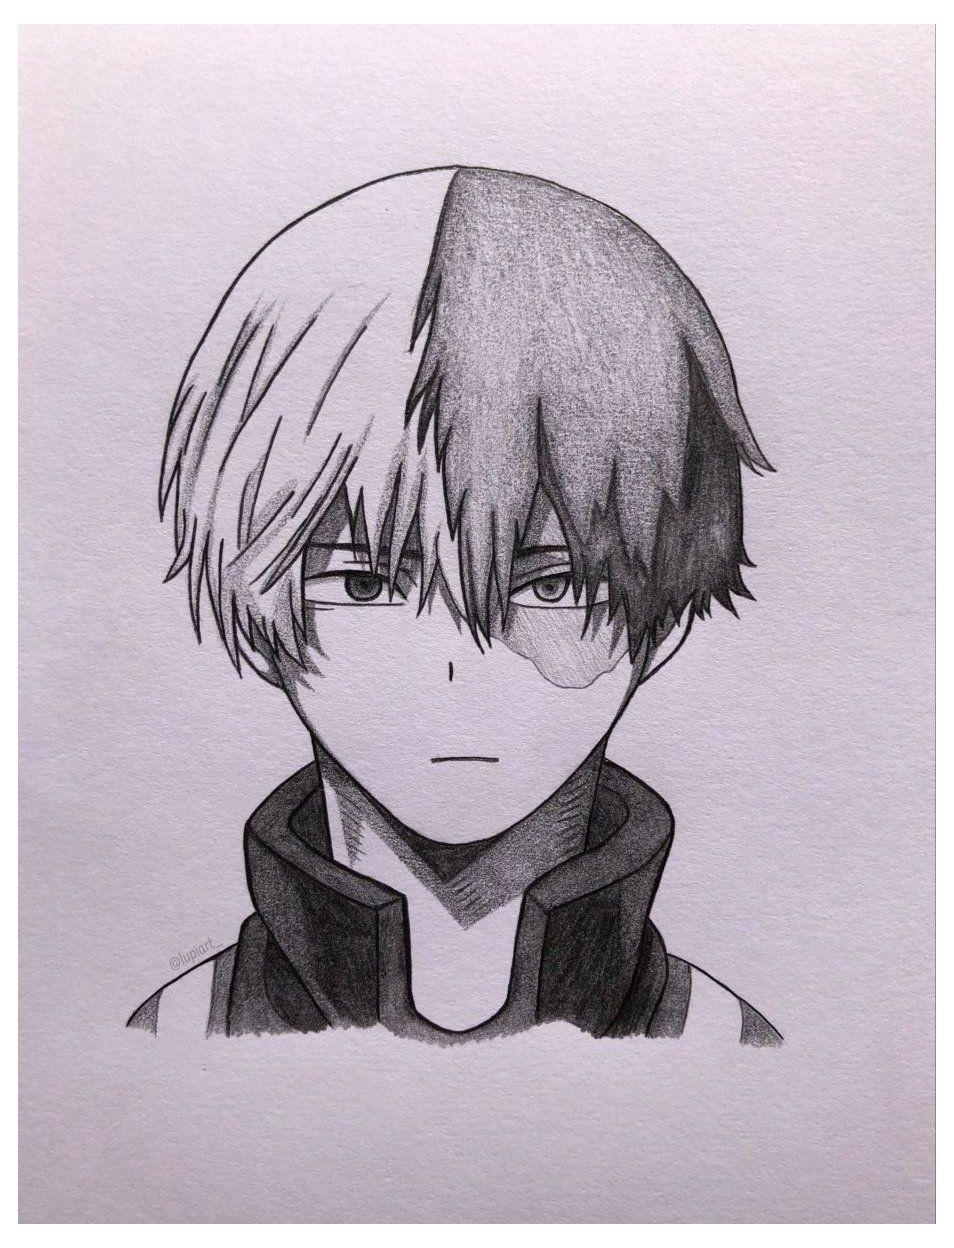 Shoto Todoroki Drawing Easy : shoto, todoroki, drawing